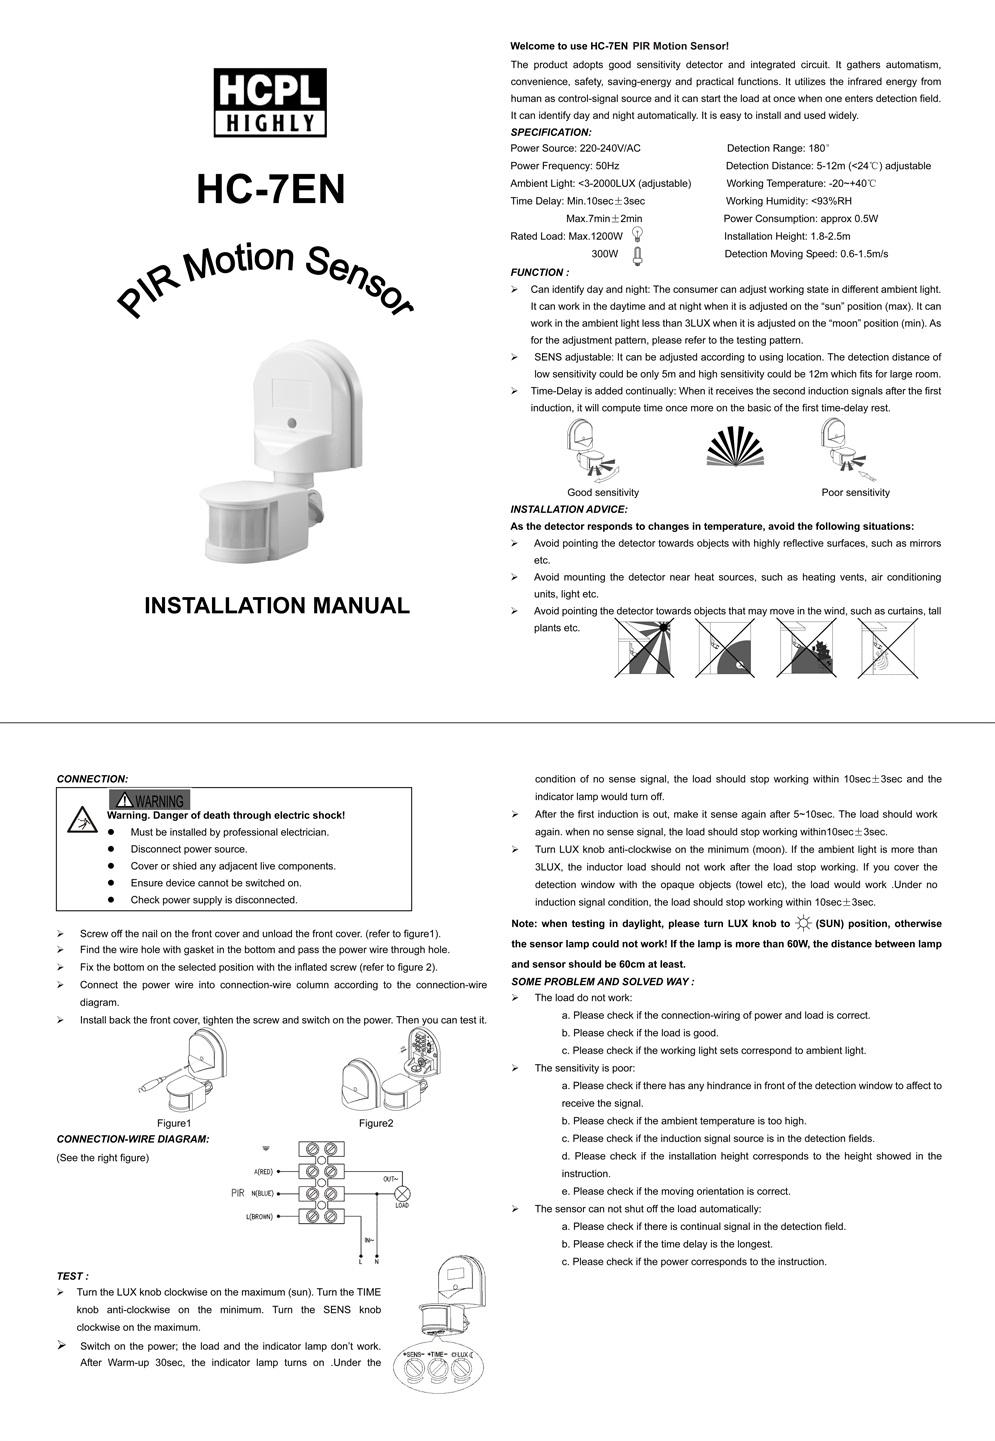 Wall Mount Pir Motion Sensor Hc 7en